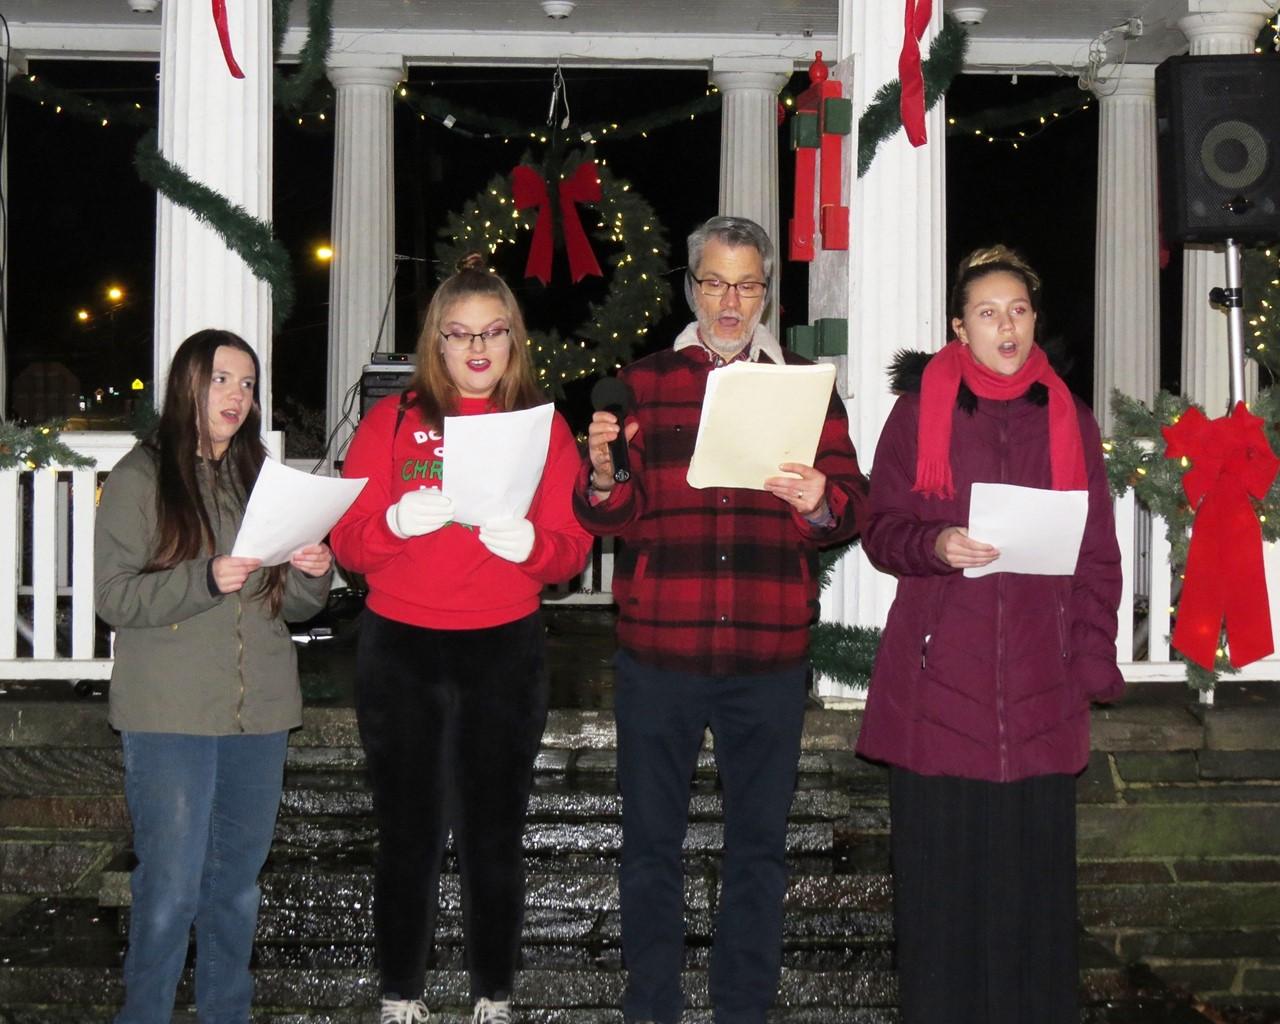 High school students singing Christmas carols on the park